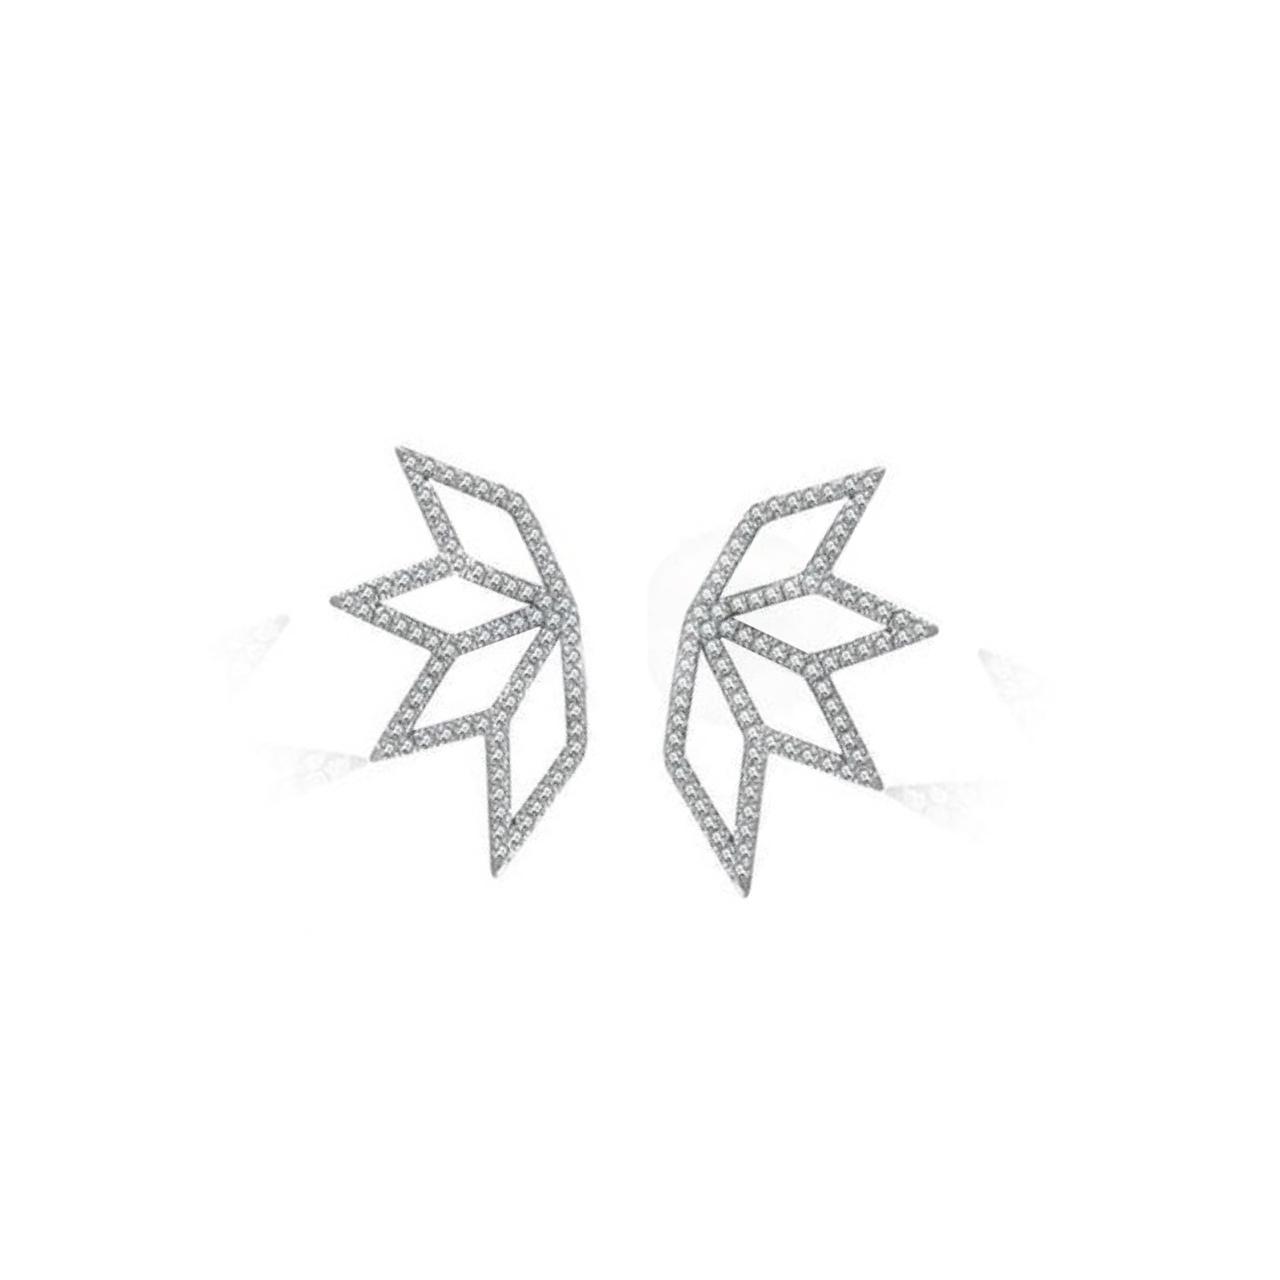 Brincos Lotus Ouro branco 18k e Diamantes